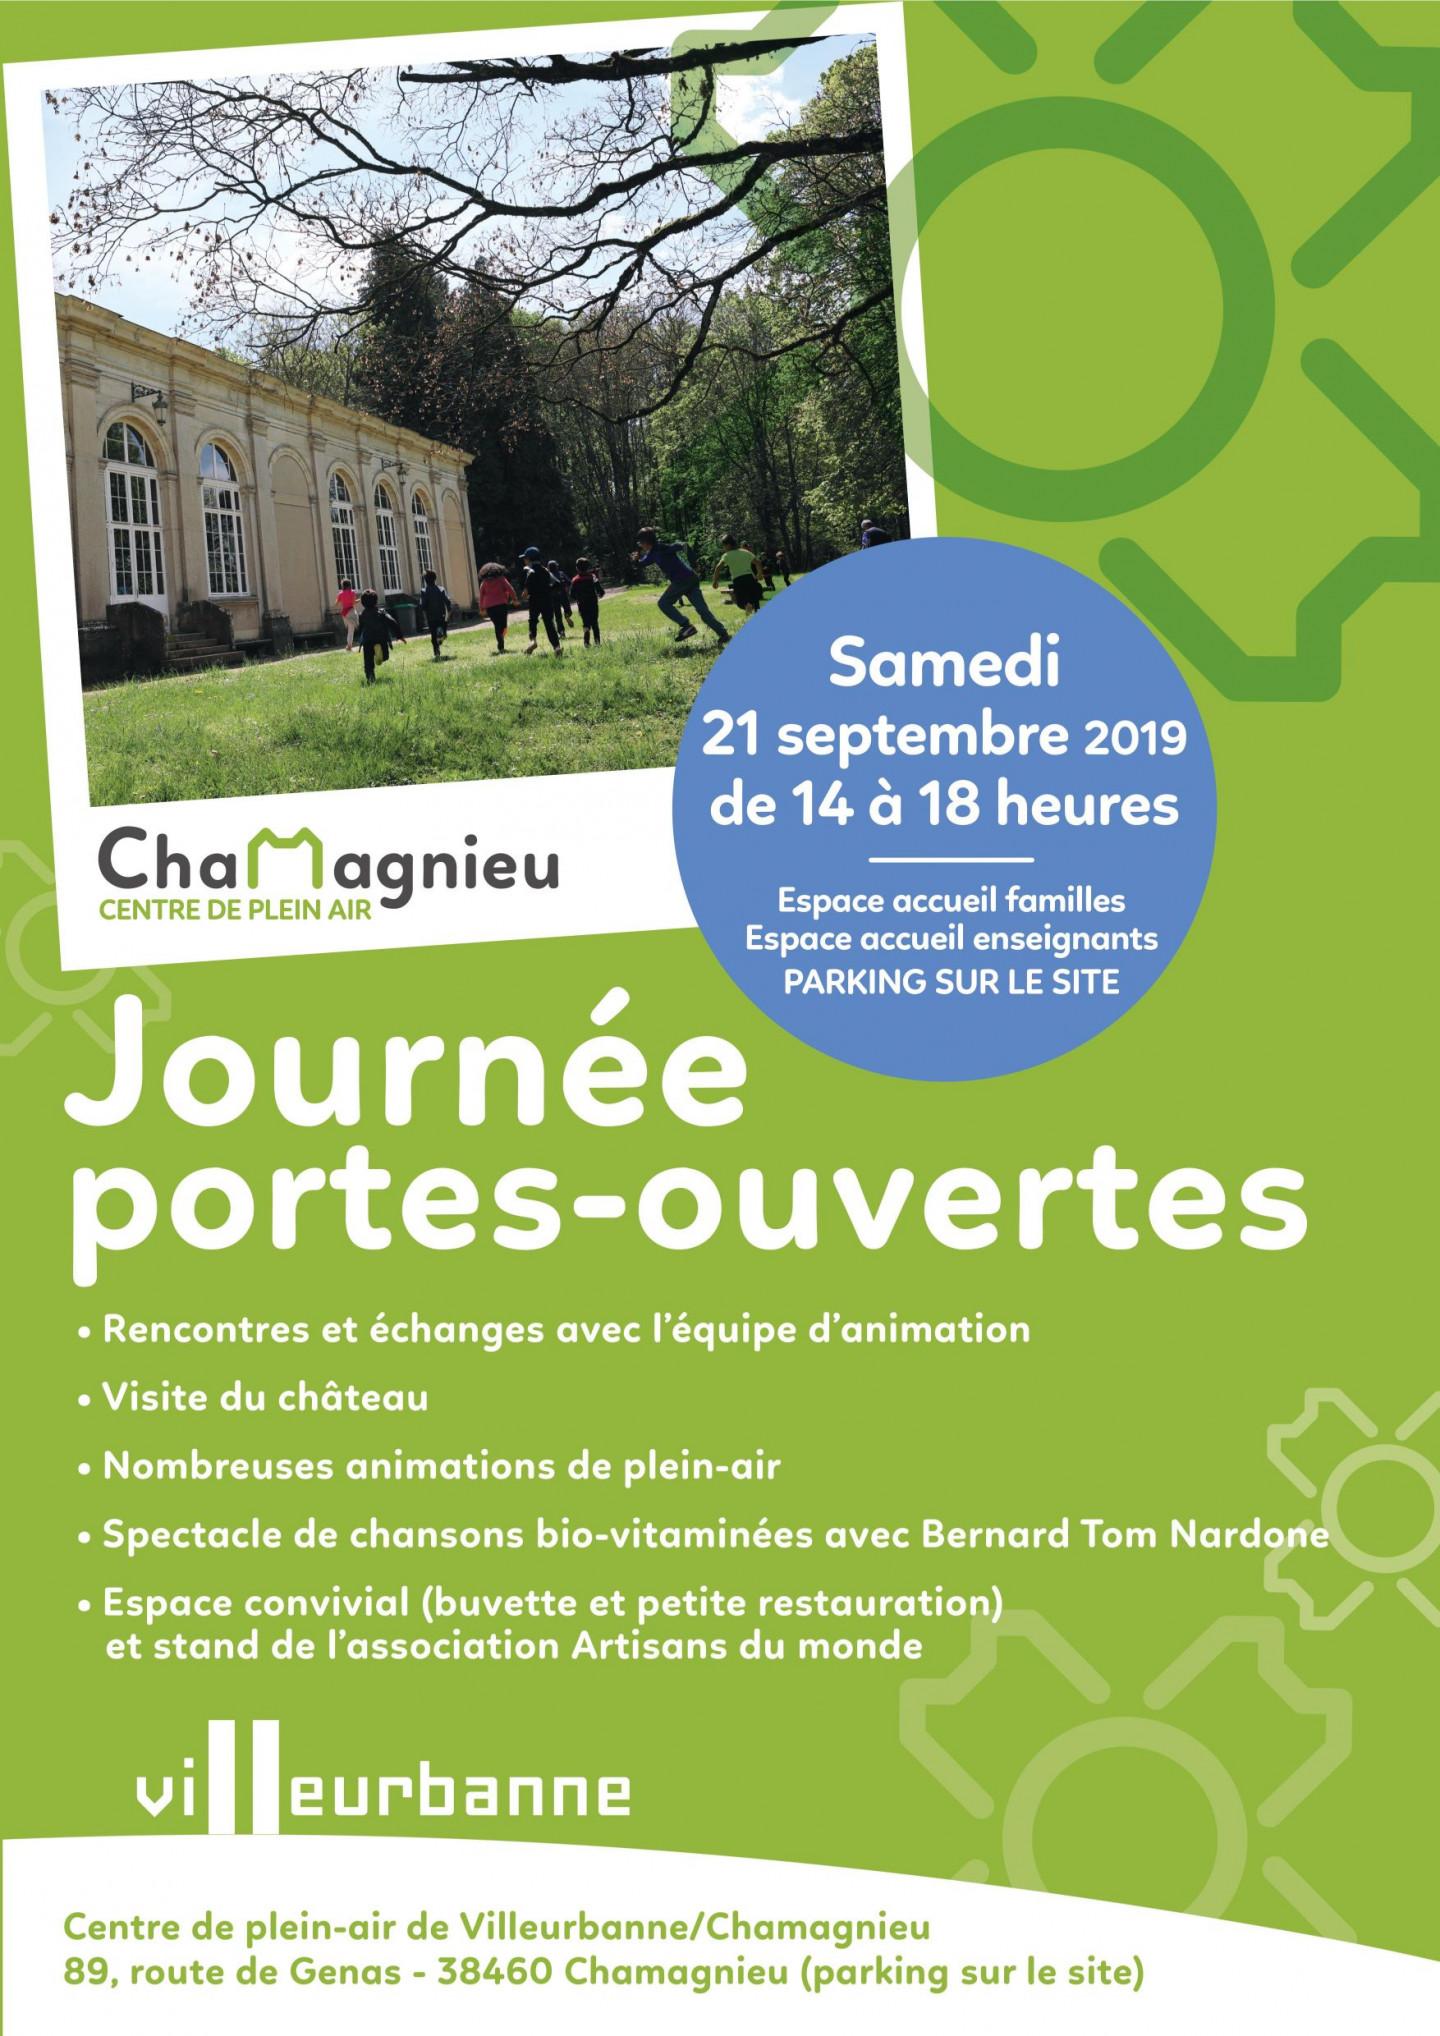 Portes-ouvertes 2019